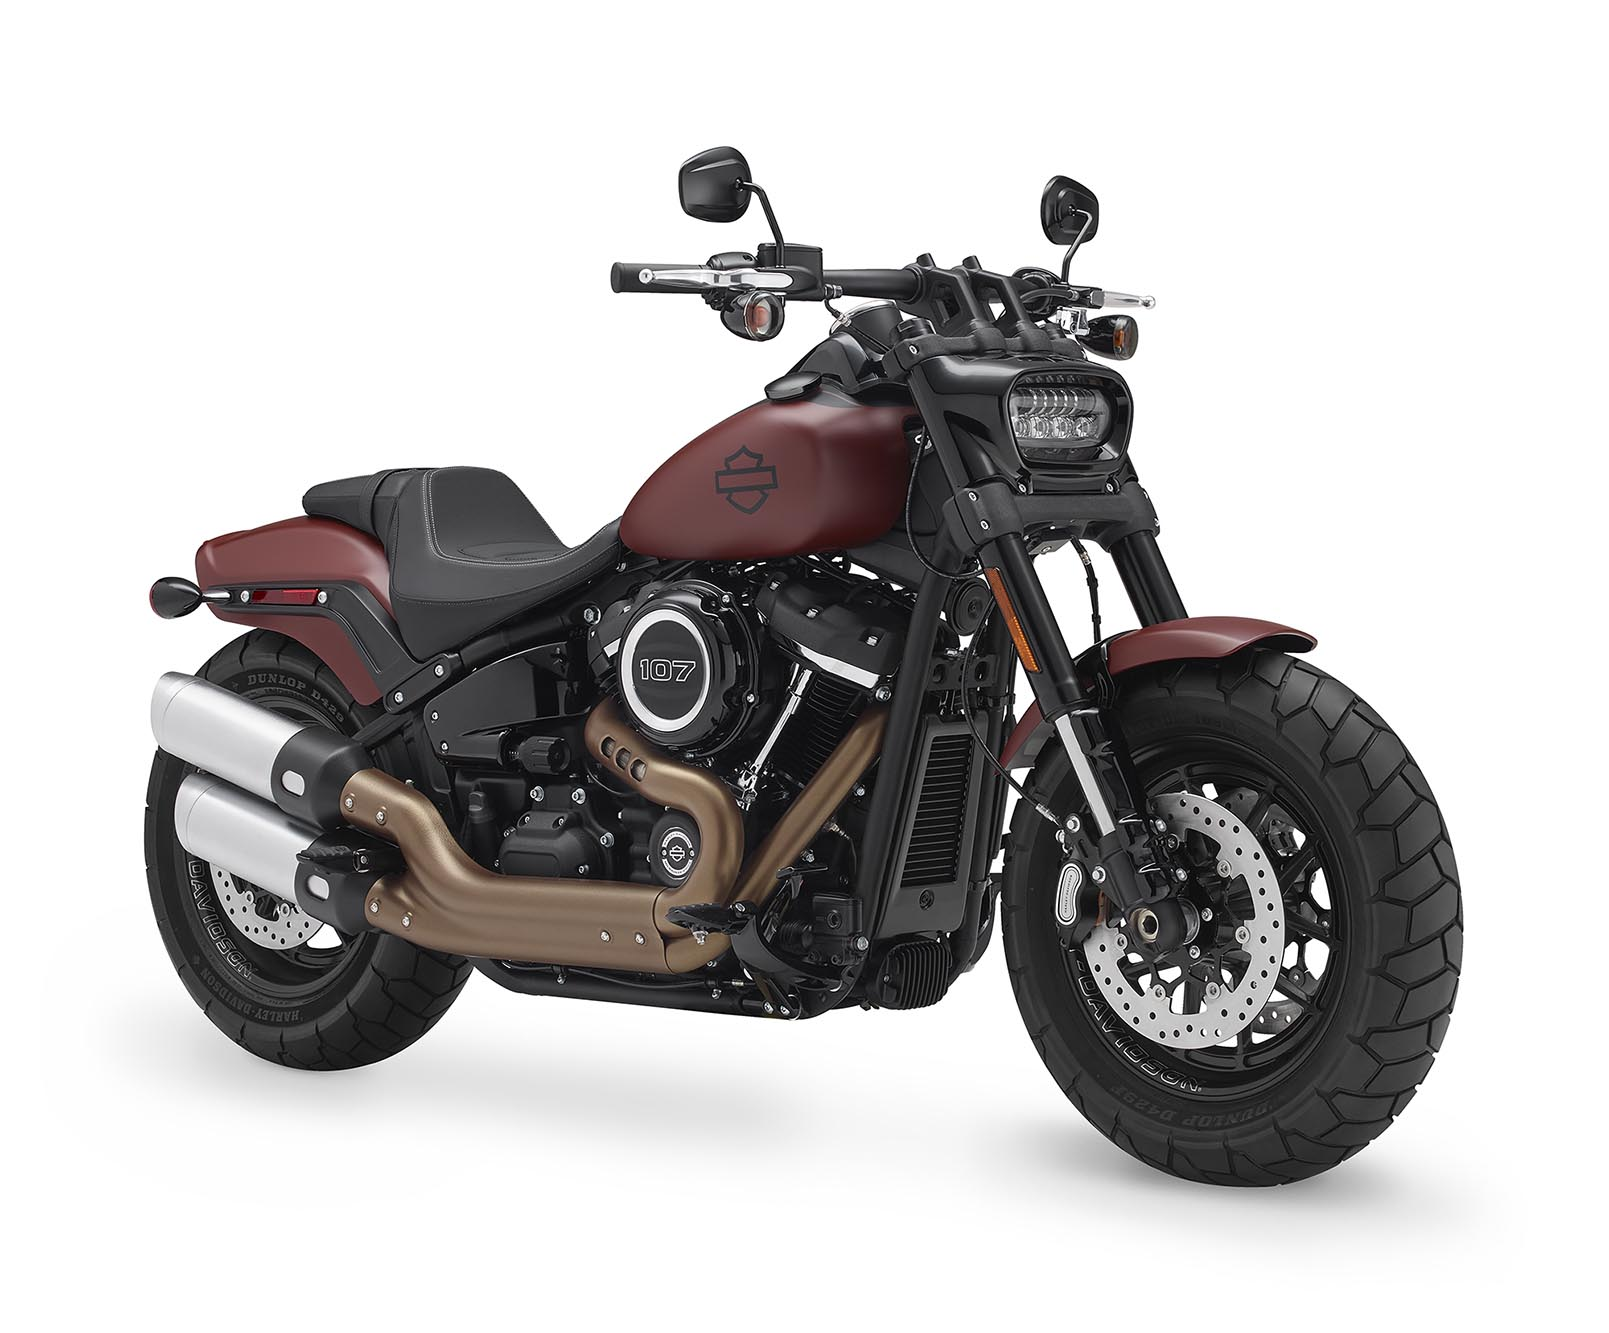 Harley Davidson Fxdr 114 India Launch Price Specs: Harley-Davidson Softail Fat Bob : La Plus Européenne